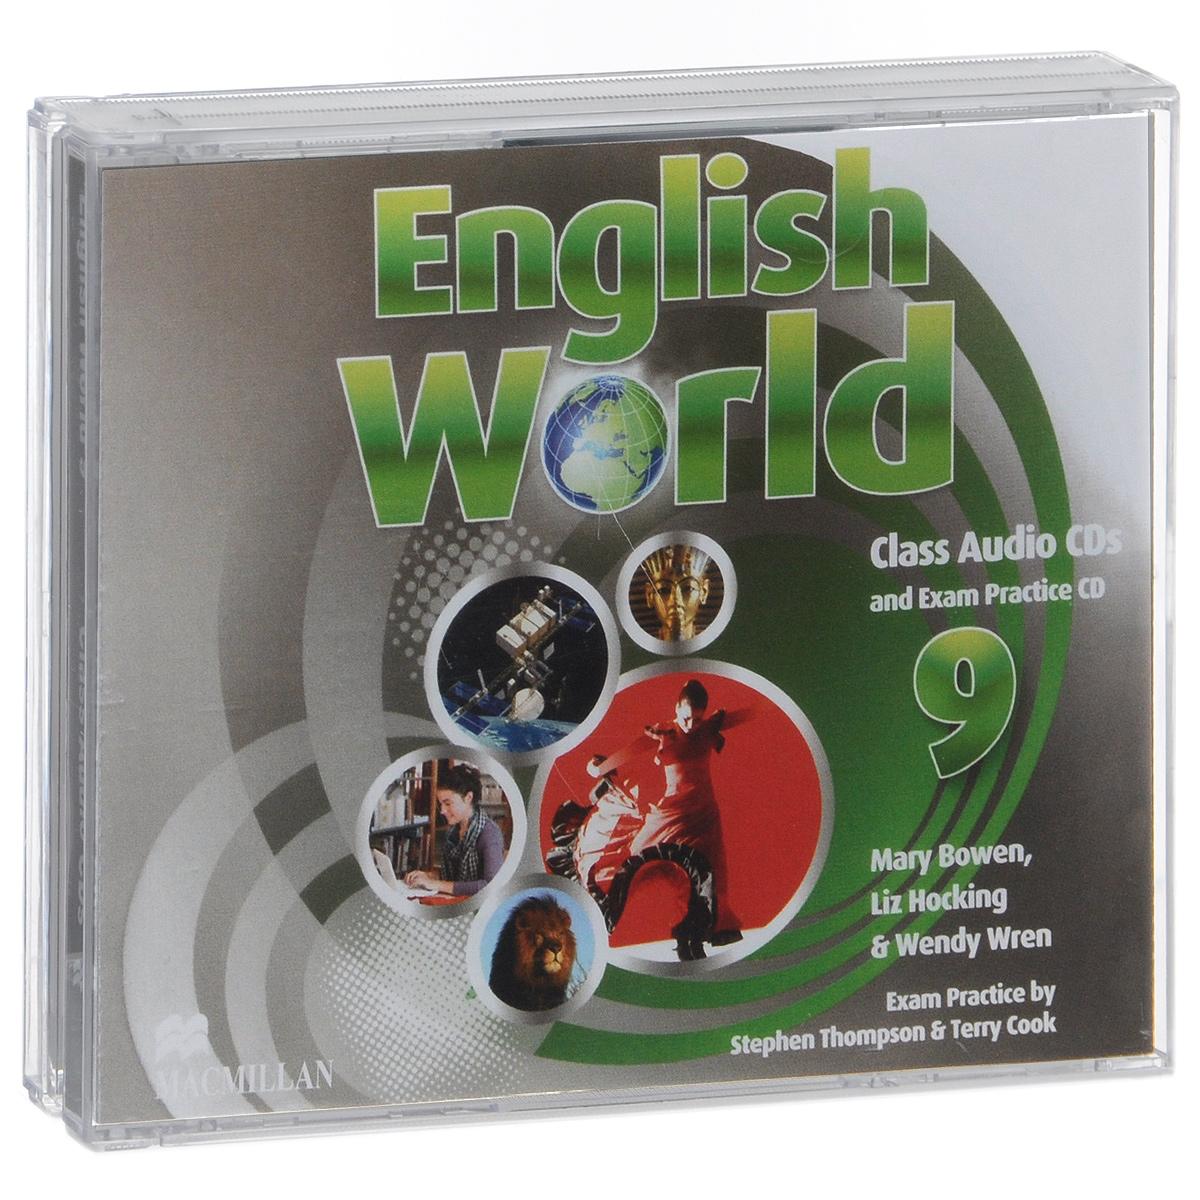 English World 9: Class Audio CDs and Exam Practice CD (аудиокурс на 3 CD)